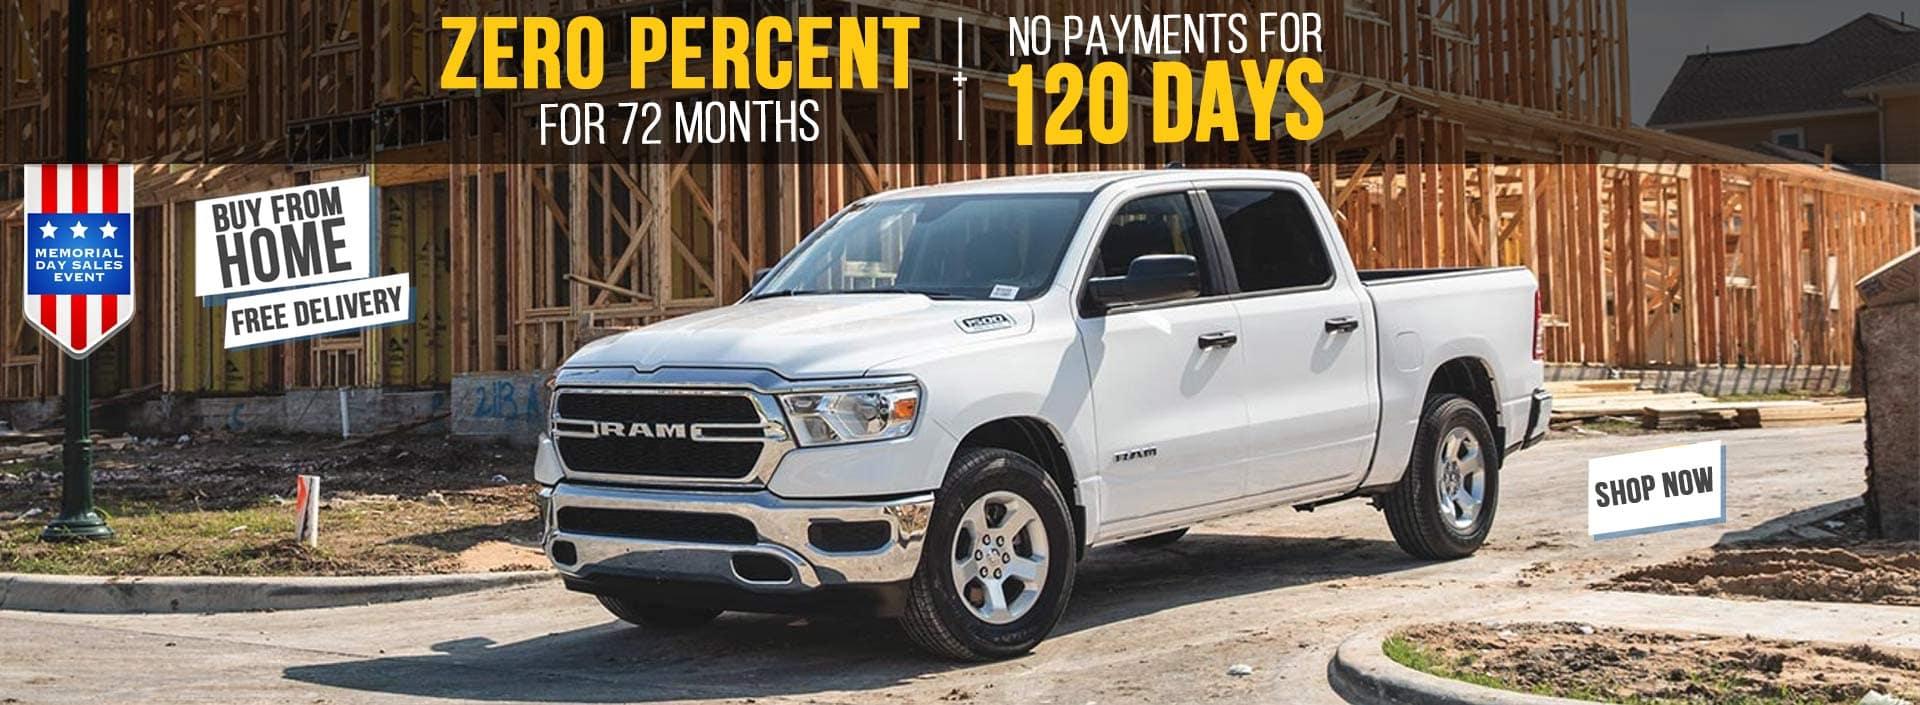 Memorial Day Ram Truck Sale